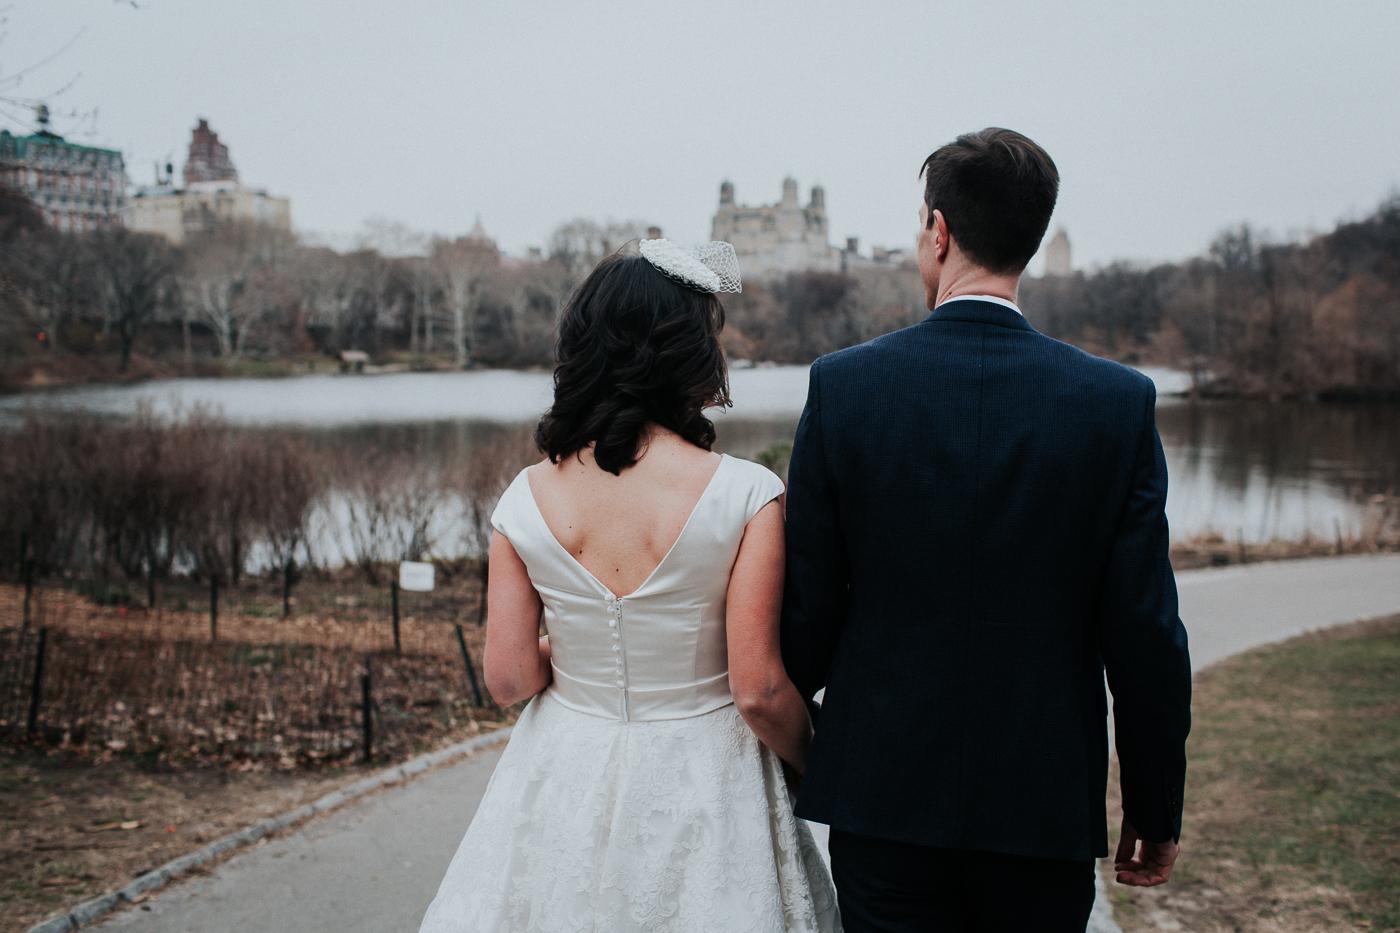 Ladies-Pavilion-Central-Park-NYC-Documentary-Elopement-Wedding-Photographer-49.jpg